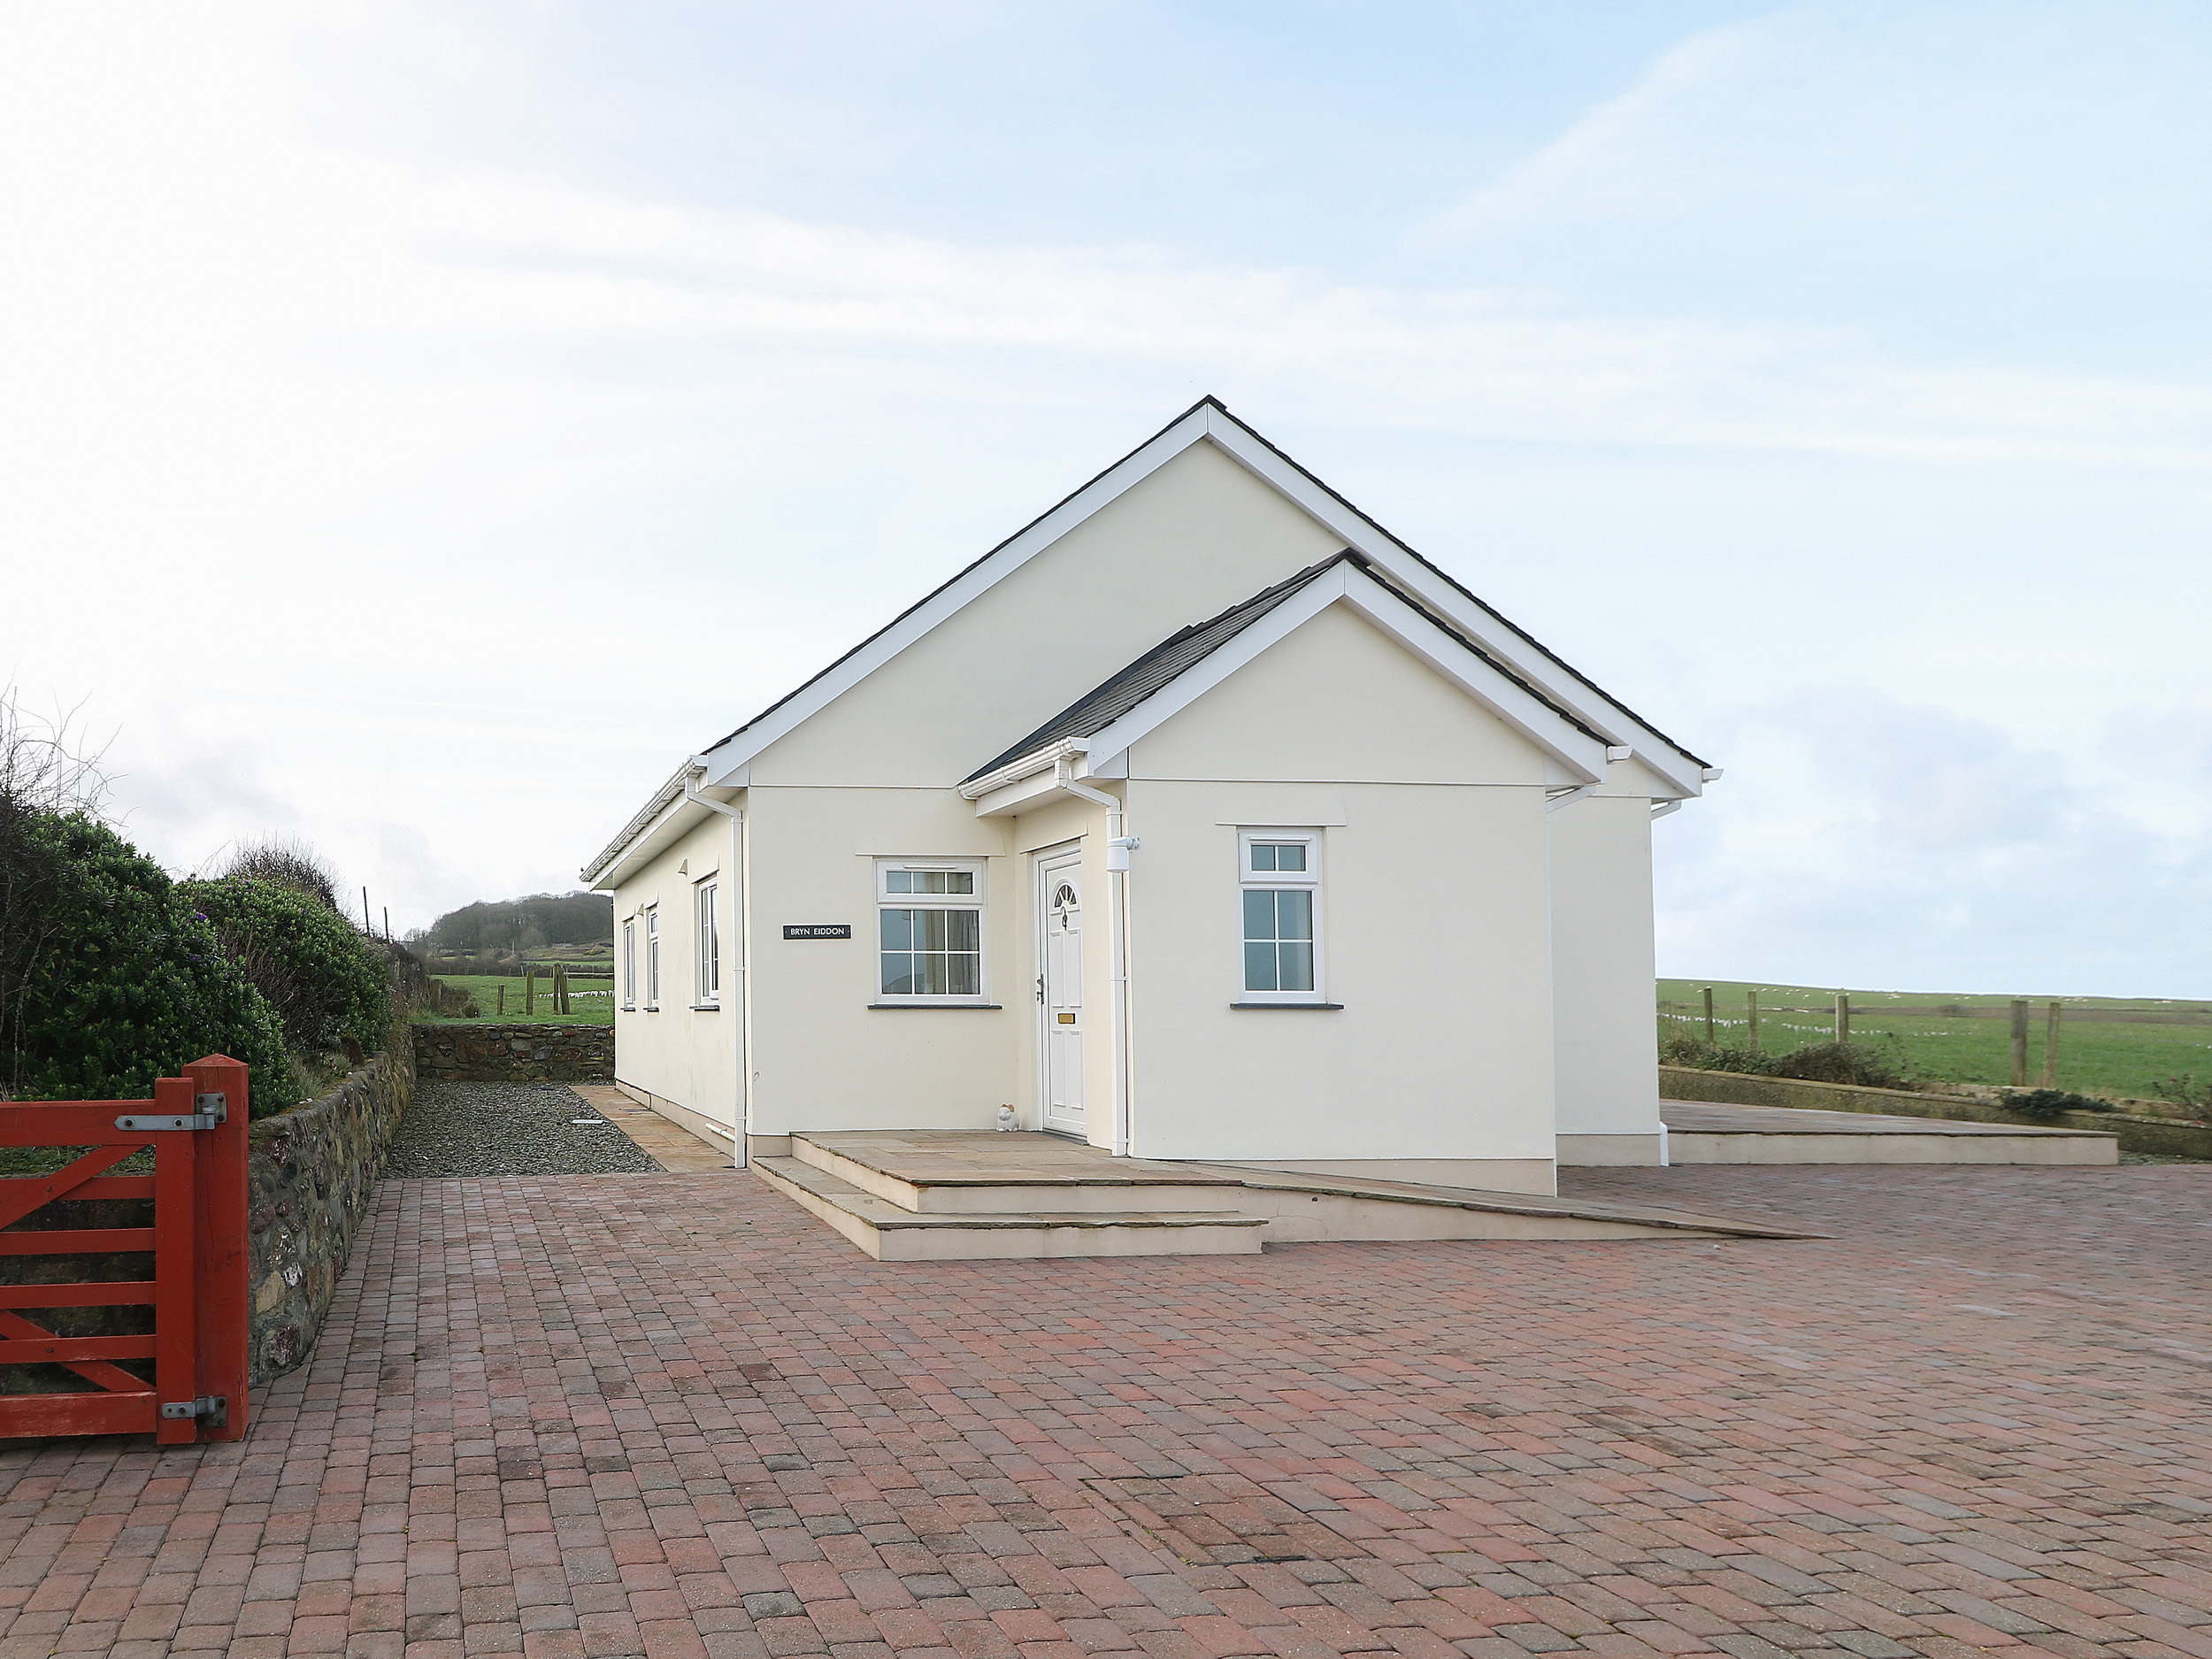 2 bedroom Cottage for rent in Aberdaron